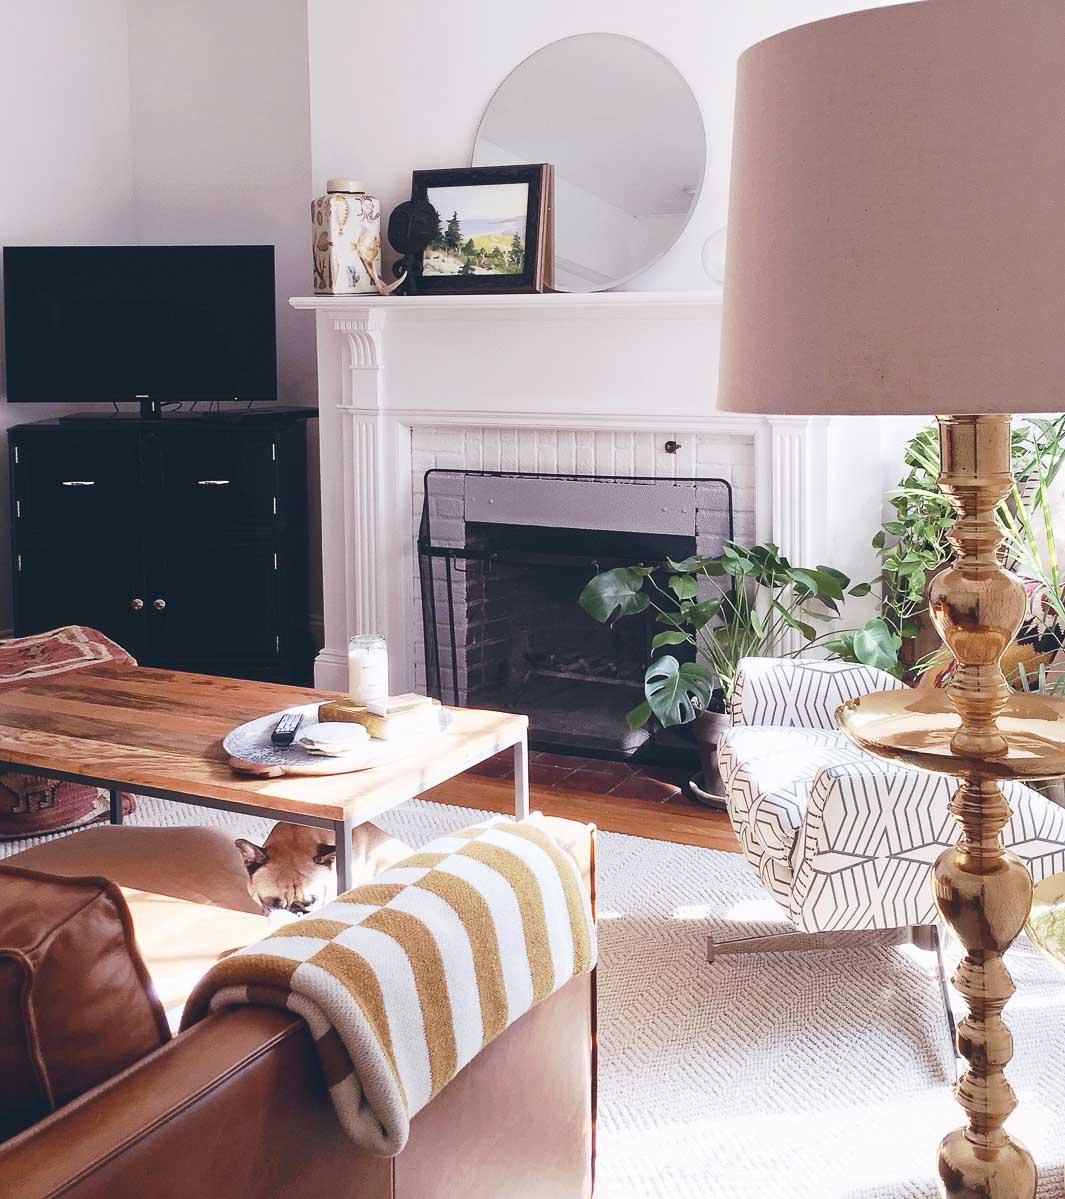 Boho-Charm-michigan-natural-light-photography-studio-lifestyle-photo-ideas-indoor-photoshoot-location-10.jpg